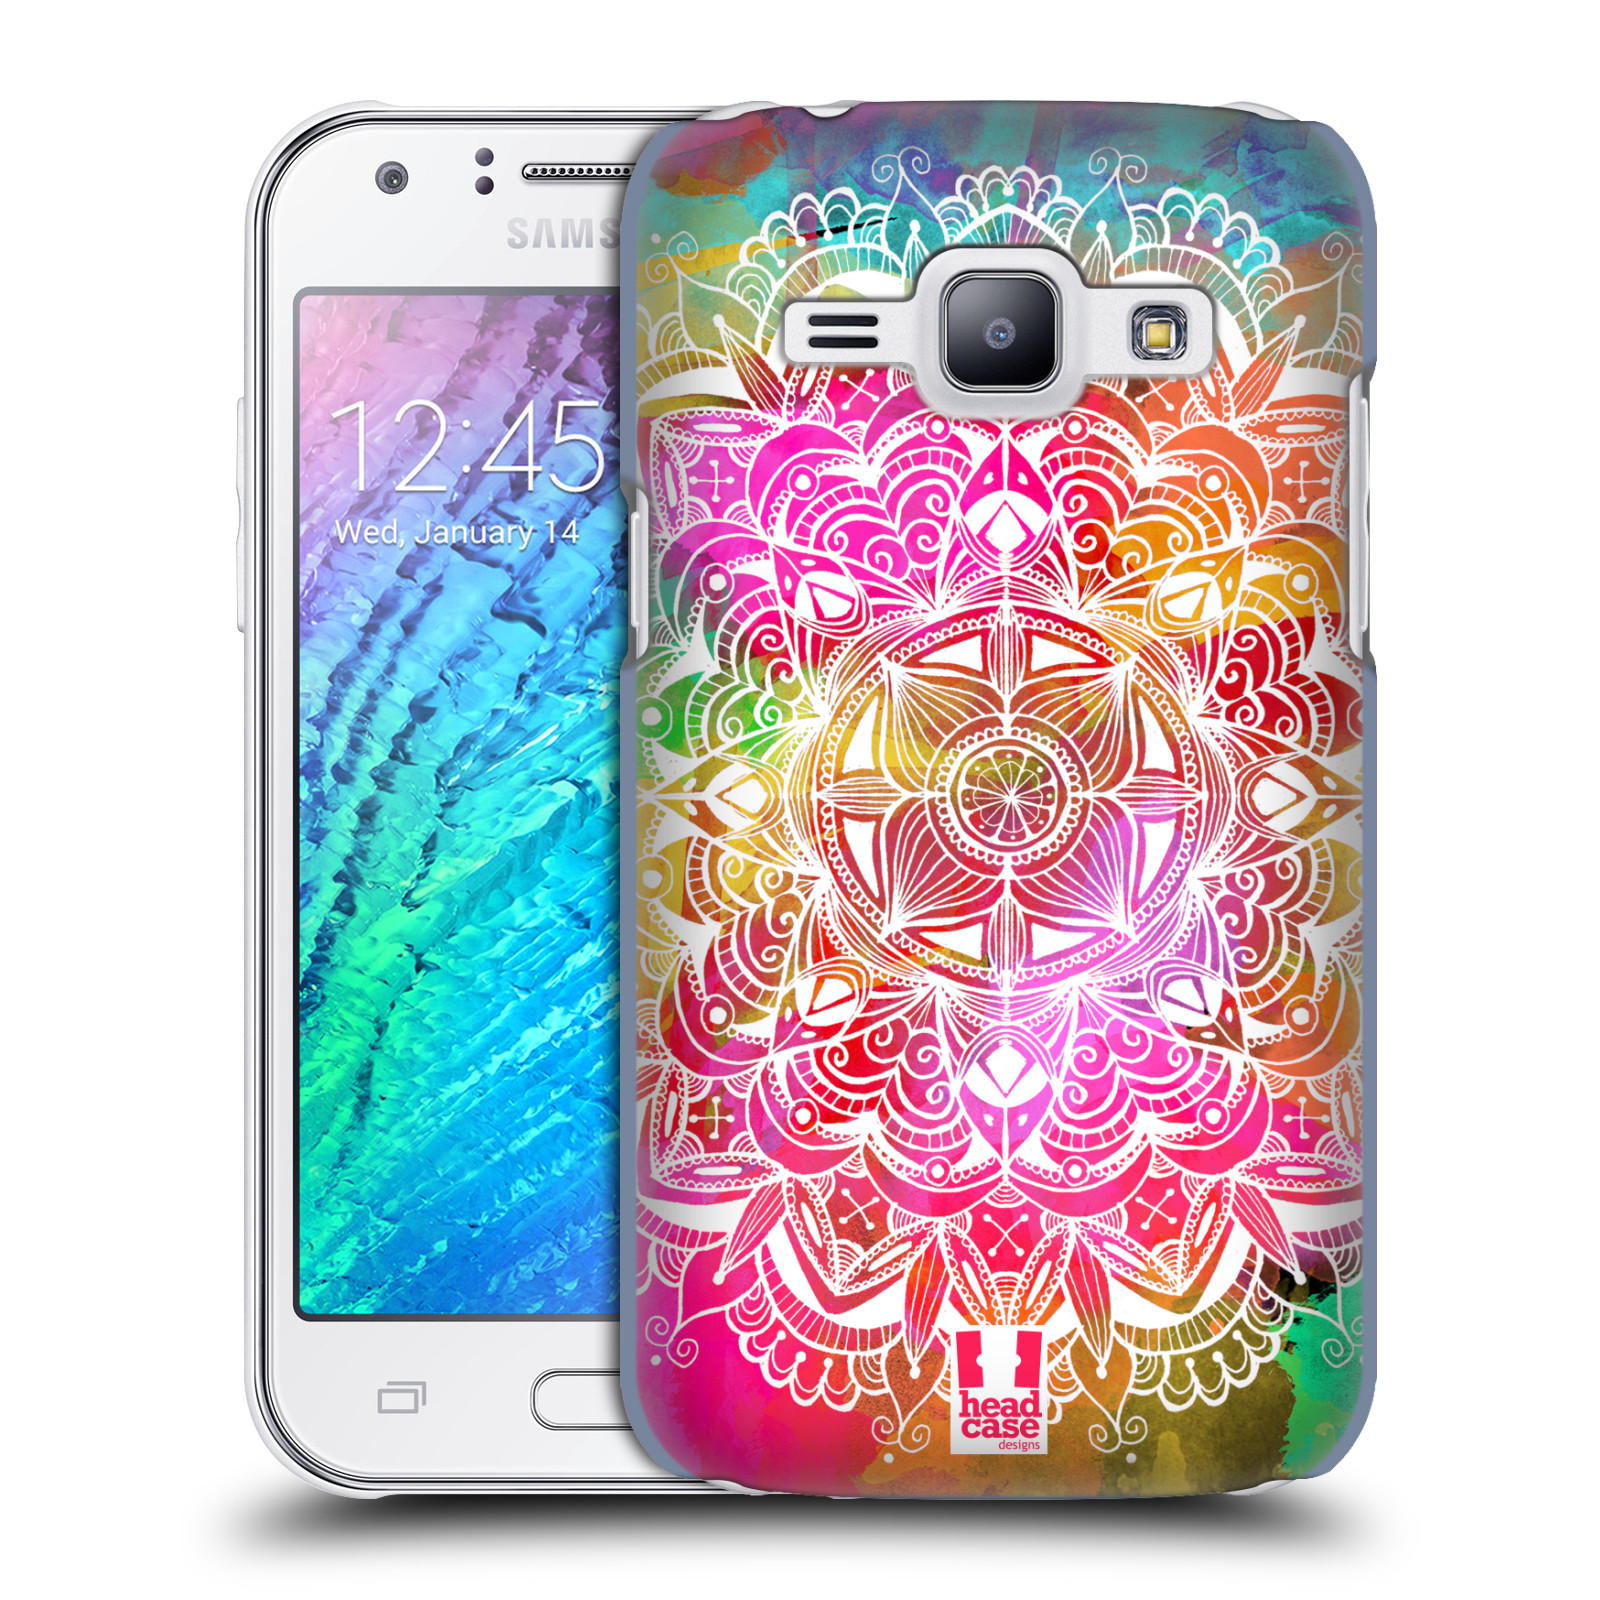 Plastové pouzdro na mobil Samsung Galaxy J1 HEAD CASE Mandala Doodle Watercolour (Kryt či obal na mobilní telefon Samsung Galaxy J1 a J1 Duos )